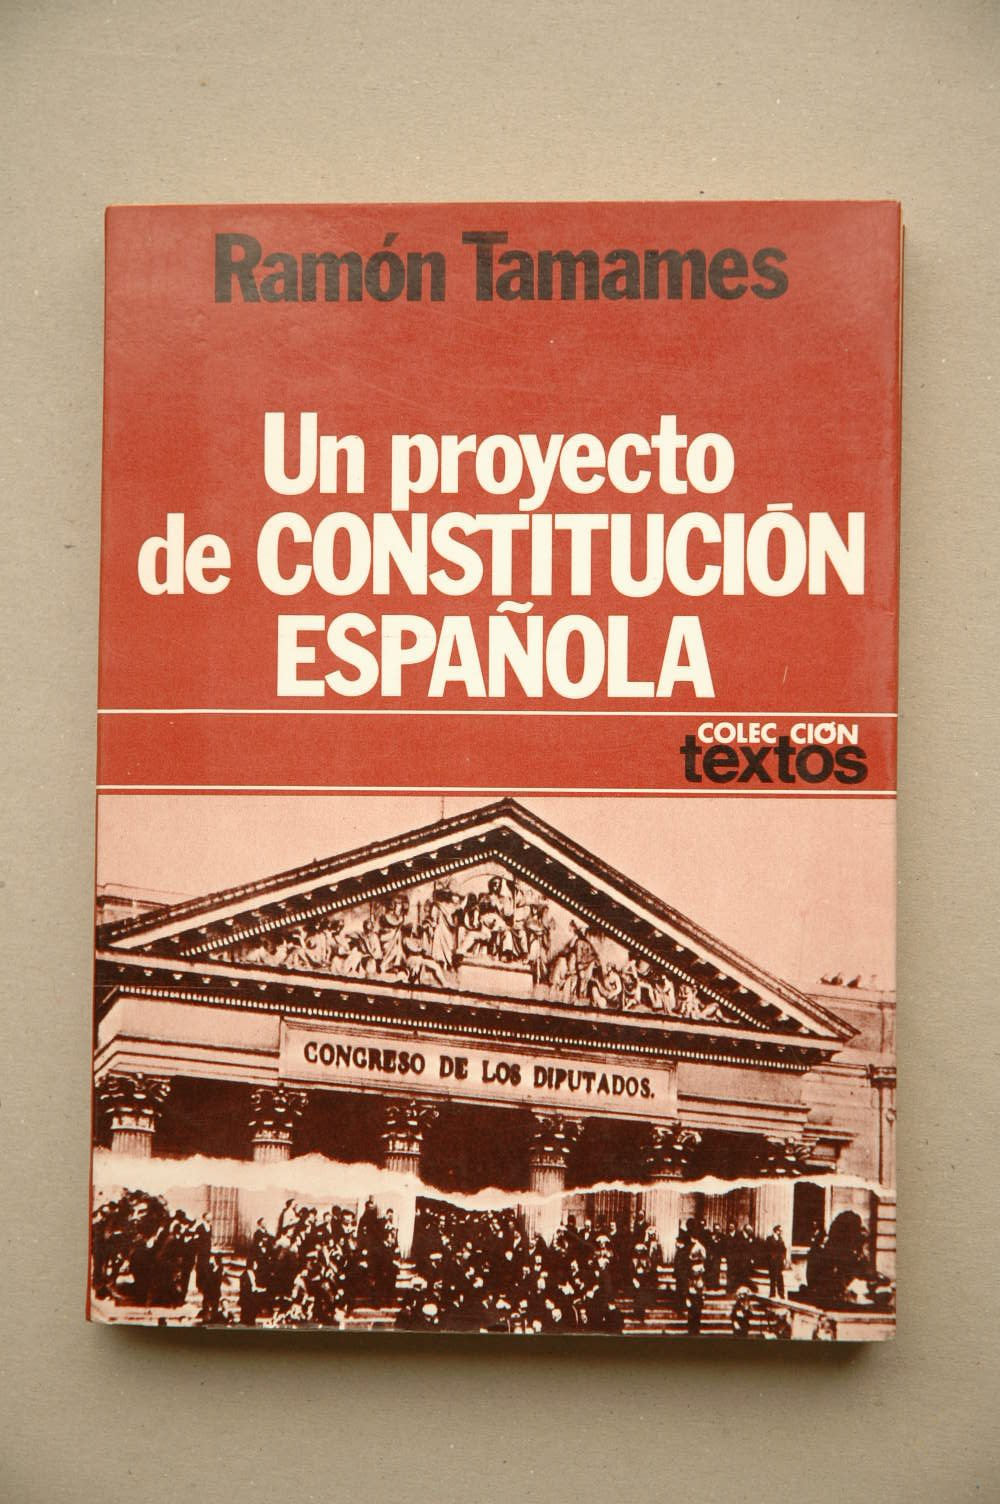 Un proyecto de Constitución española Colección Textos: Amazon.es: Tamames, Ramón: Libros en idiomas extranjeros